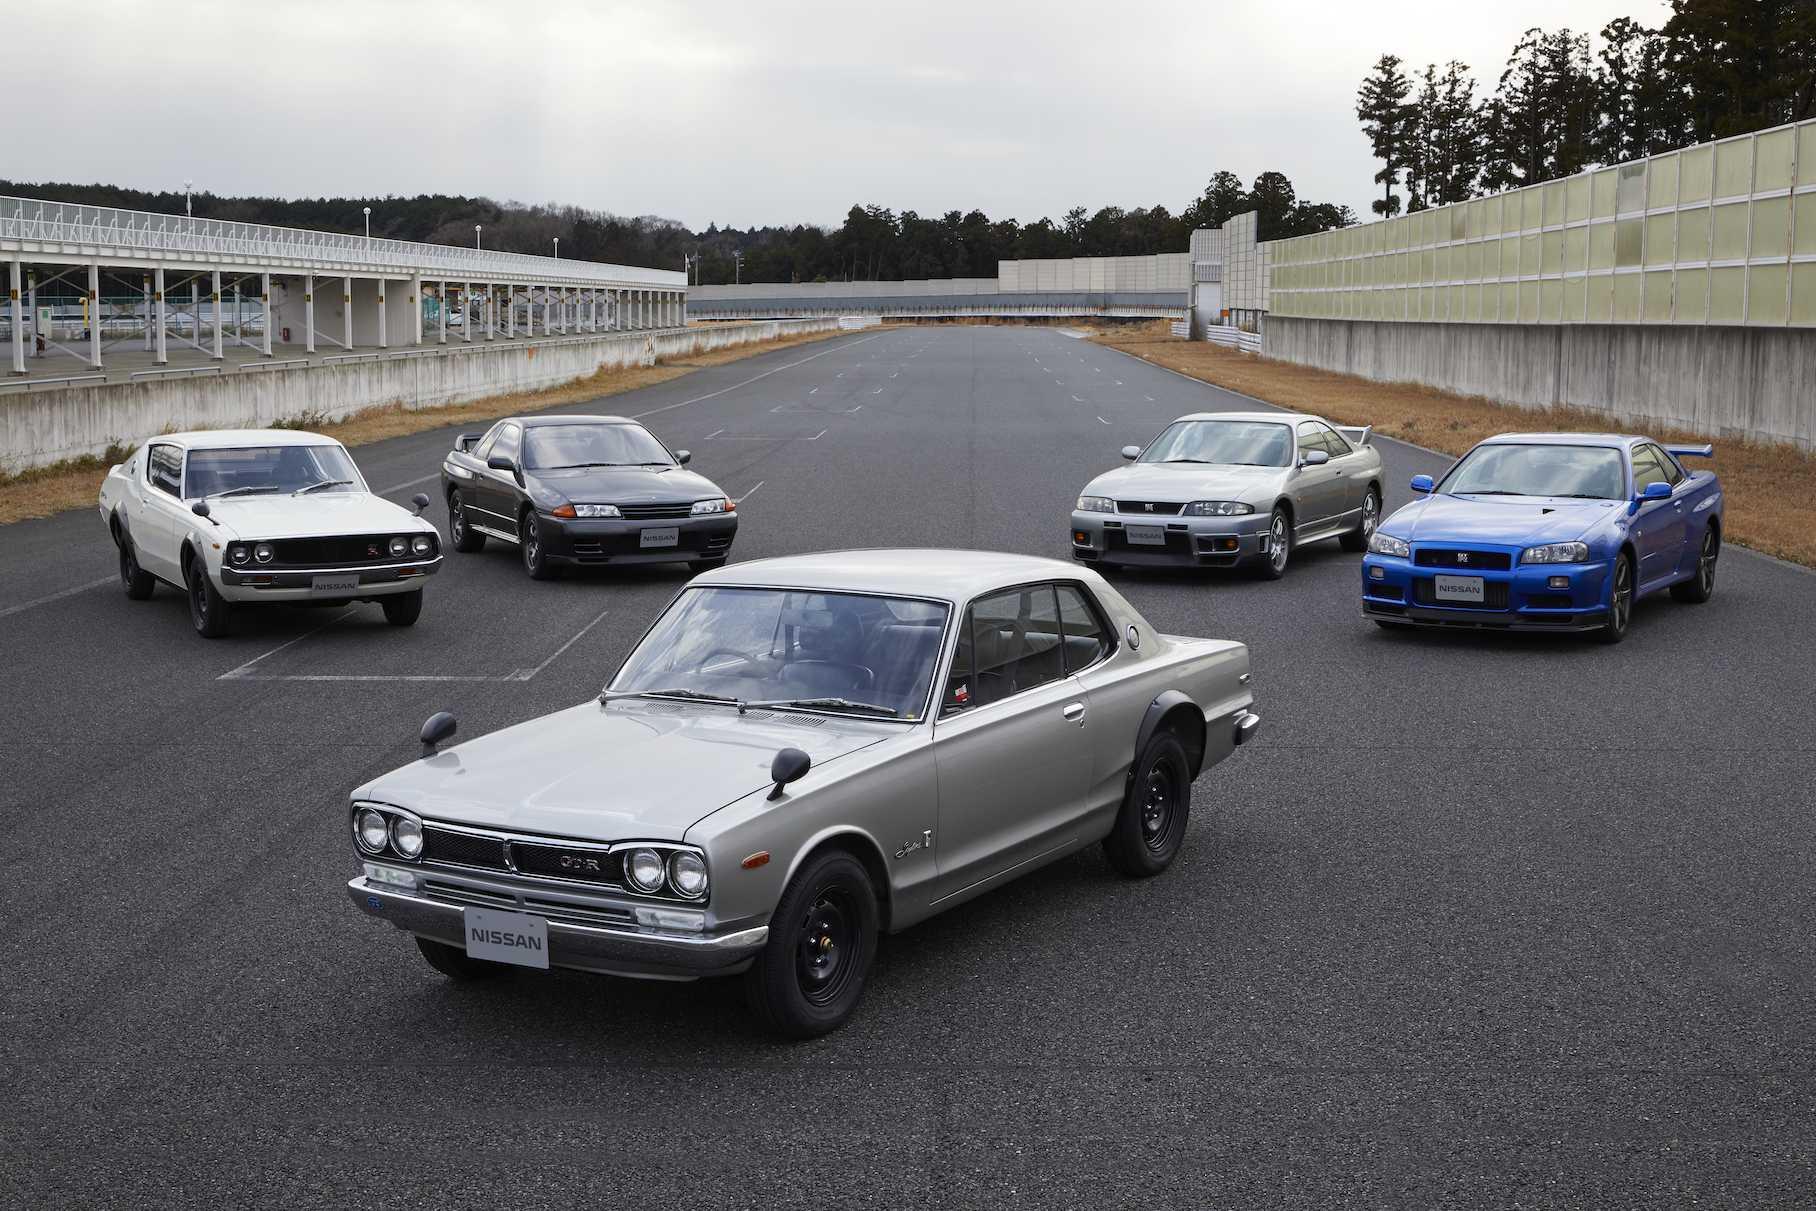 Nissan gt-r (ниссан гт-р)